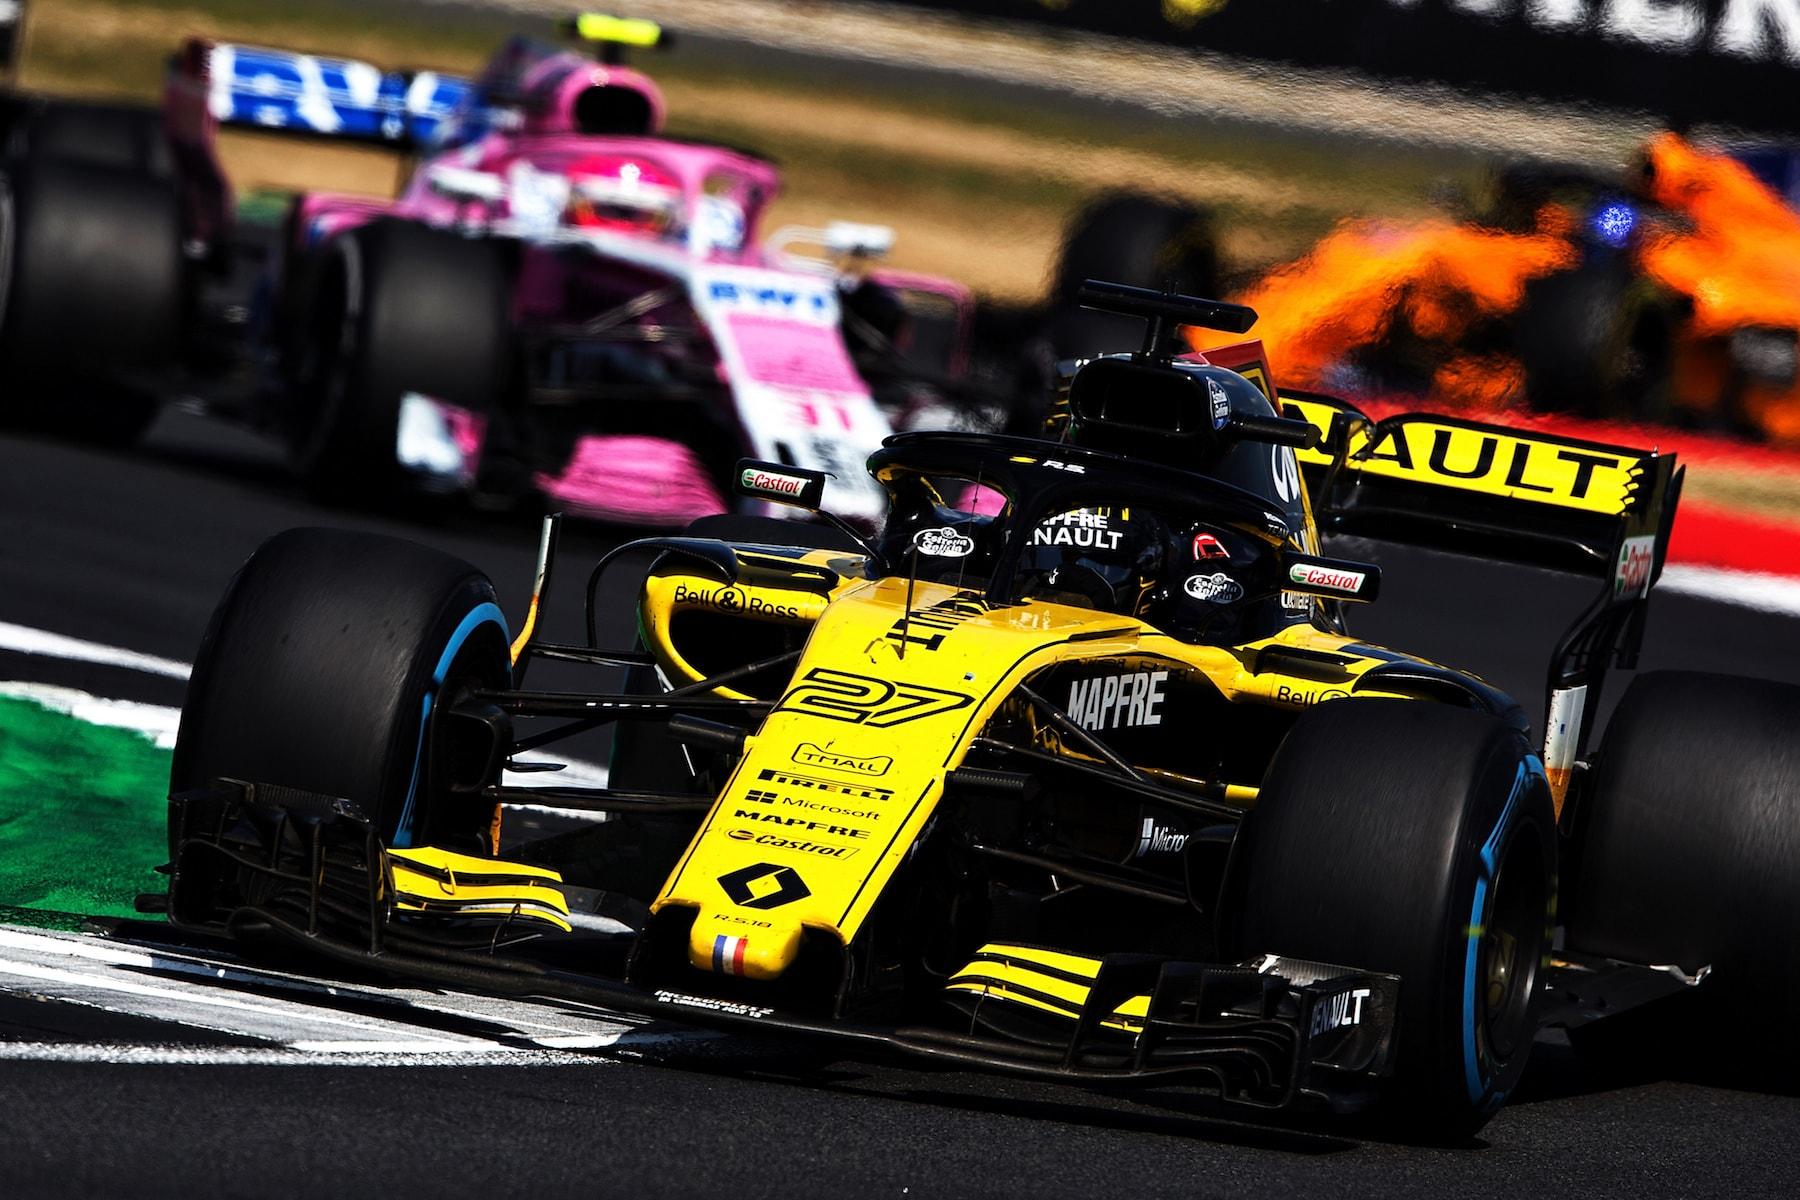 G 2018 Nico Hulkenberg | Renault RS18 | 2018 British GP 1 copy.jpg